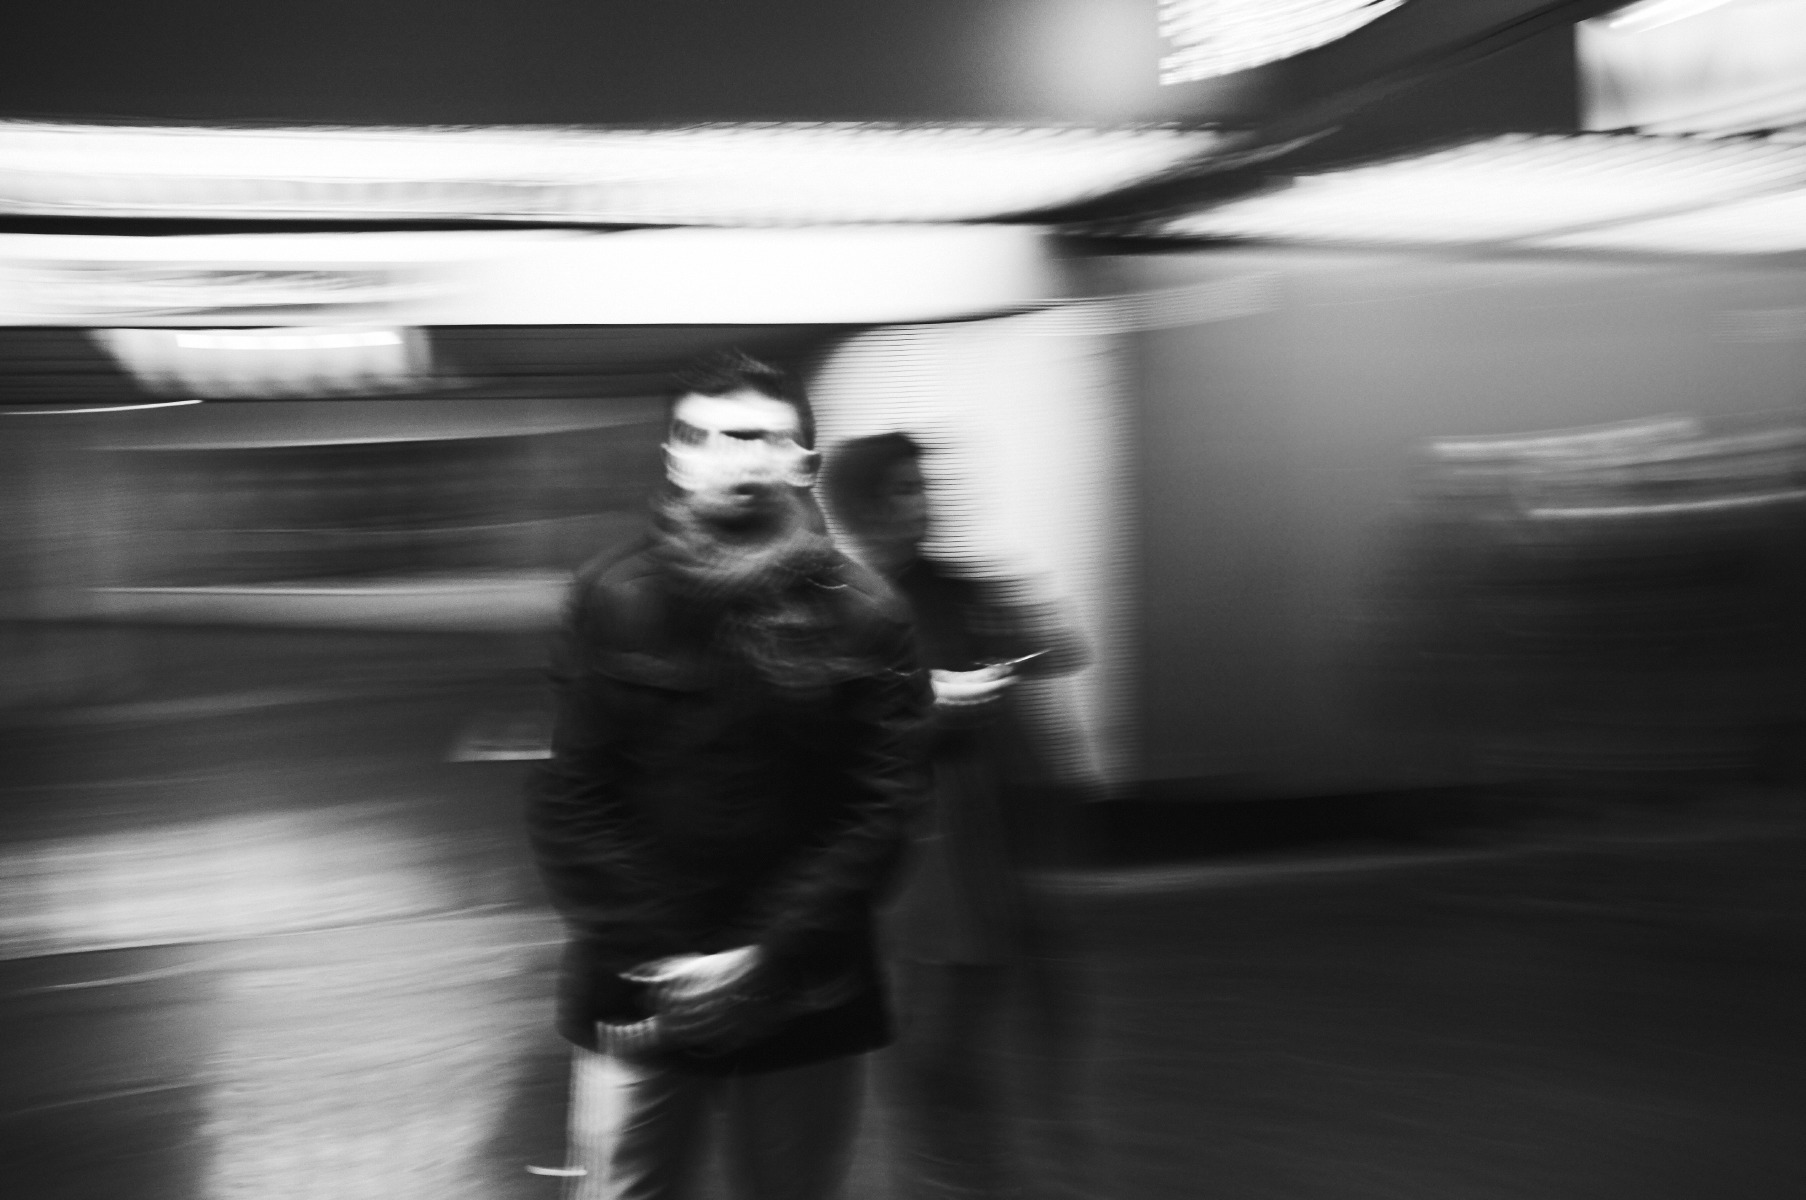 Man waiting on a plateform by Emmanuel Pineau